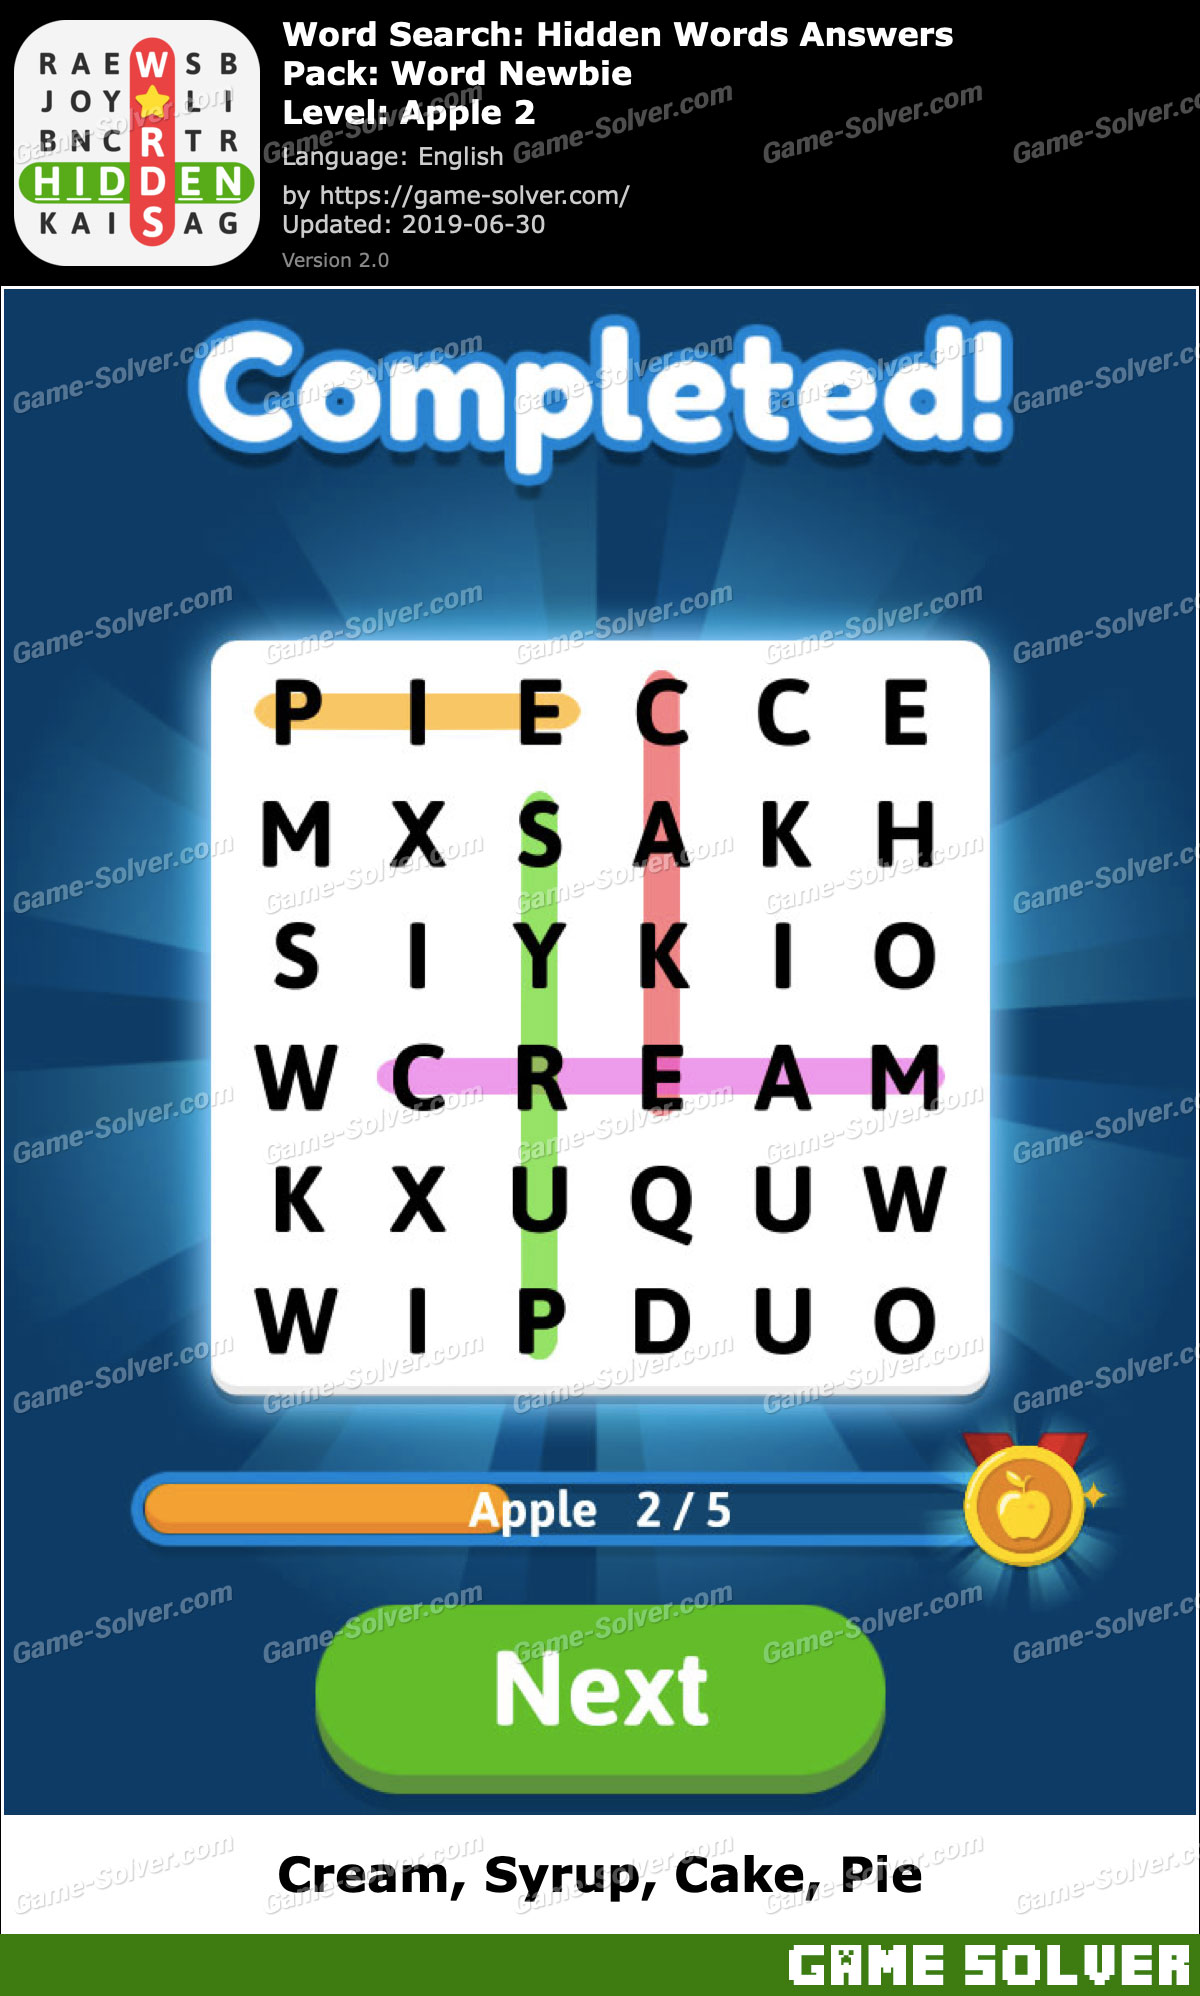 Word Search Hidden Words Word Newbie-Apple 2 Answers